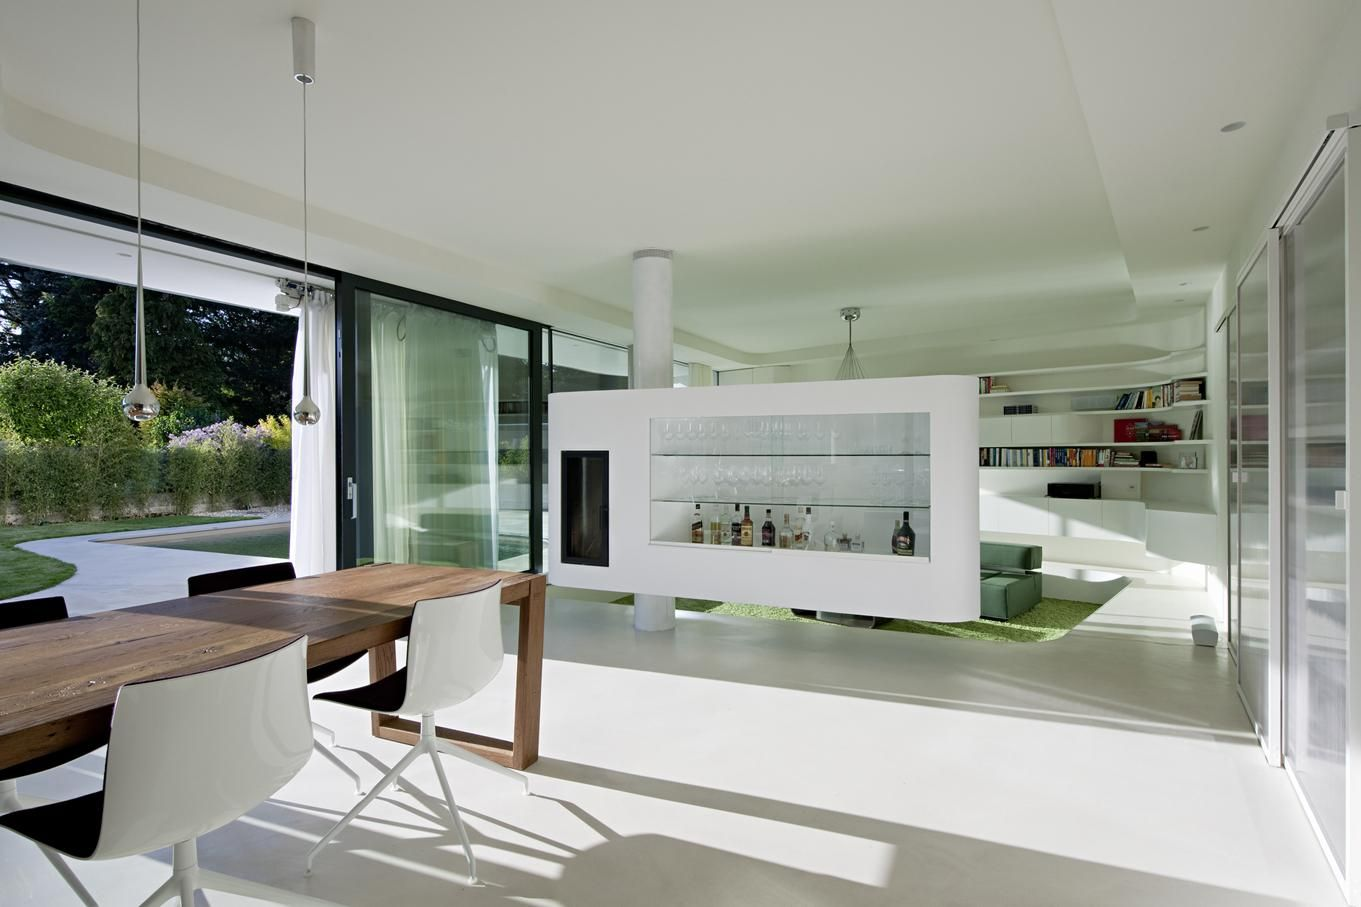 500m living room by Caramel architekten zt gmbh #Architects   Hertha Hurnaus